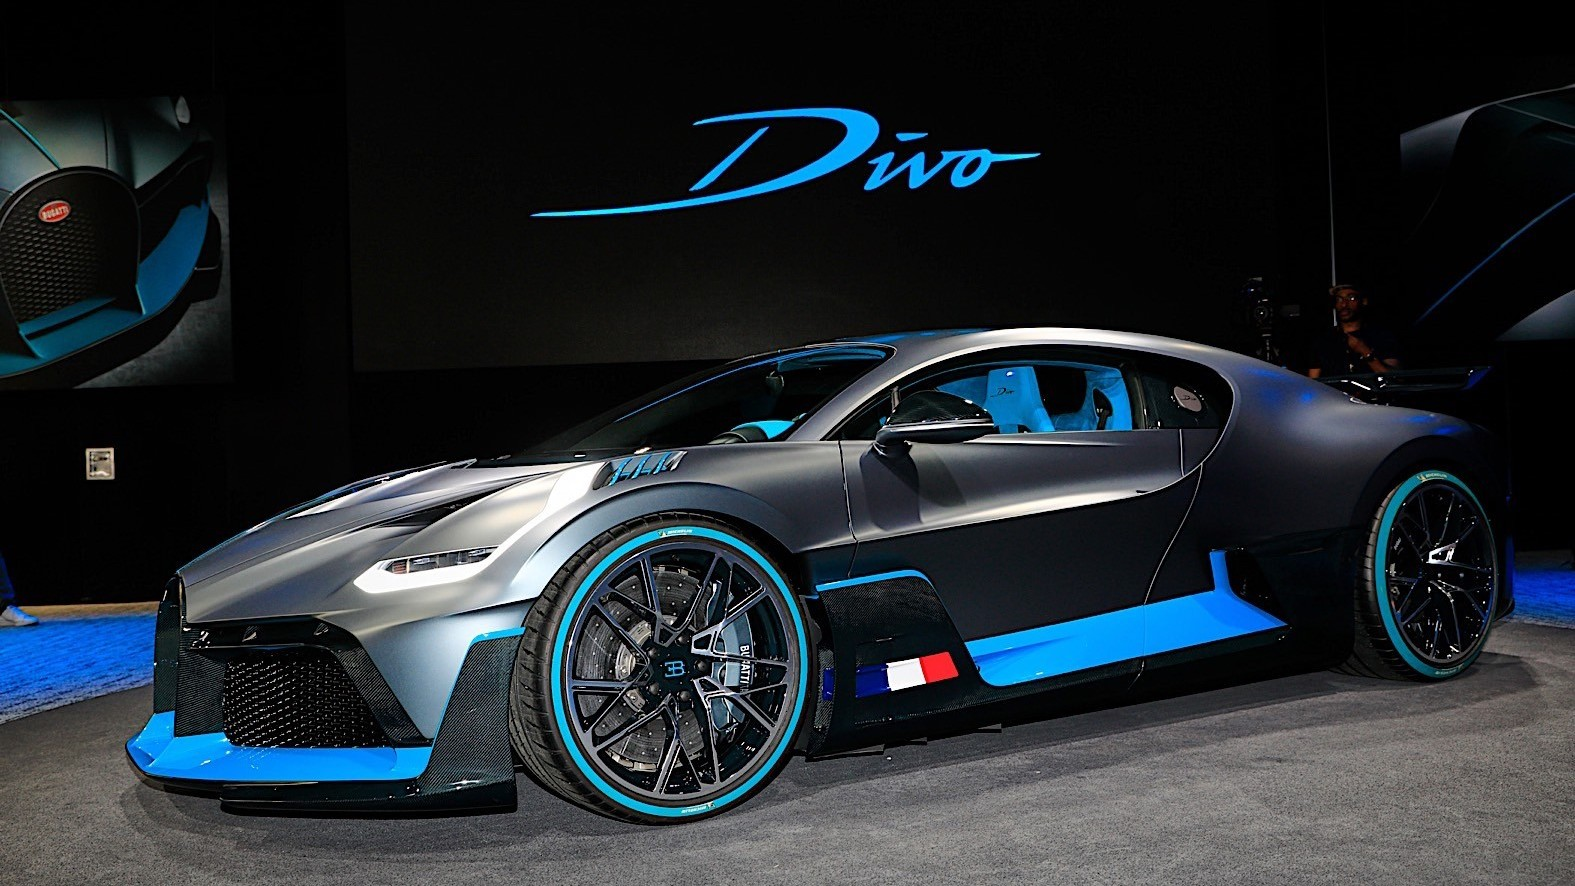 bugatti-divo-cuts-no-corners-at-the-paris-motor-show_36